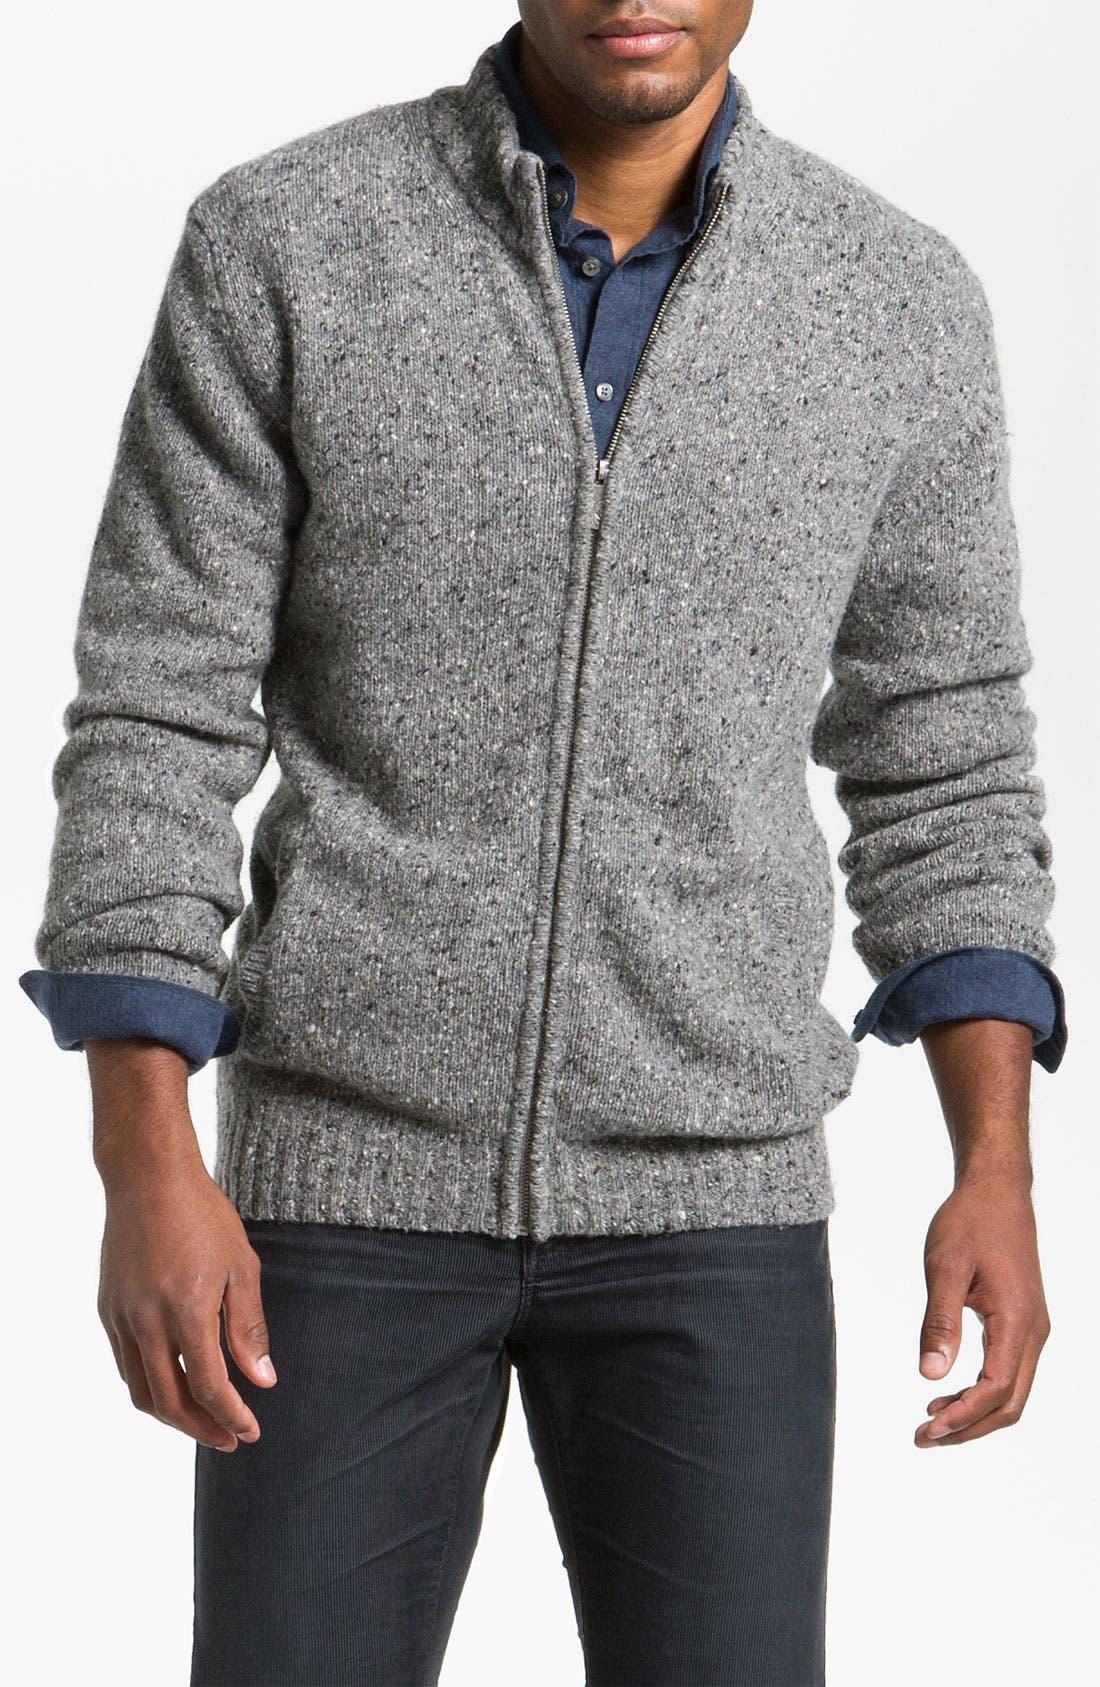 Main Image - Hickey Freeman 'Donegal' Wool Blend Zip Cardigan